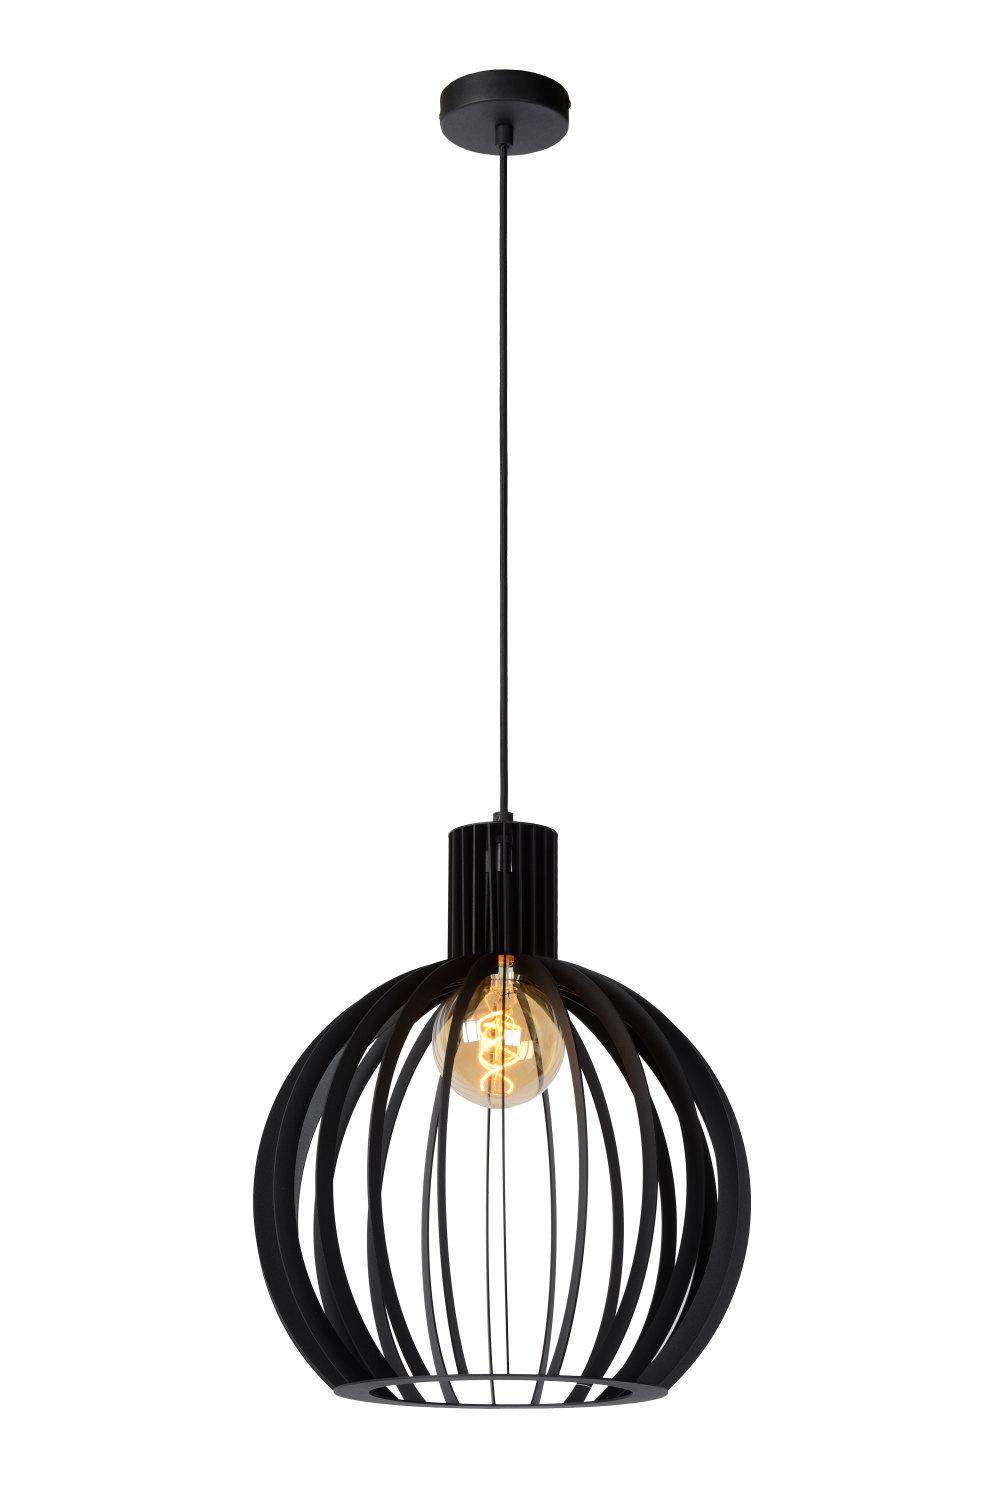 Lucide MIKAELA Hanglamp-Zwart-Ø35-1xE27-60W-Metaal